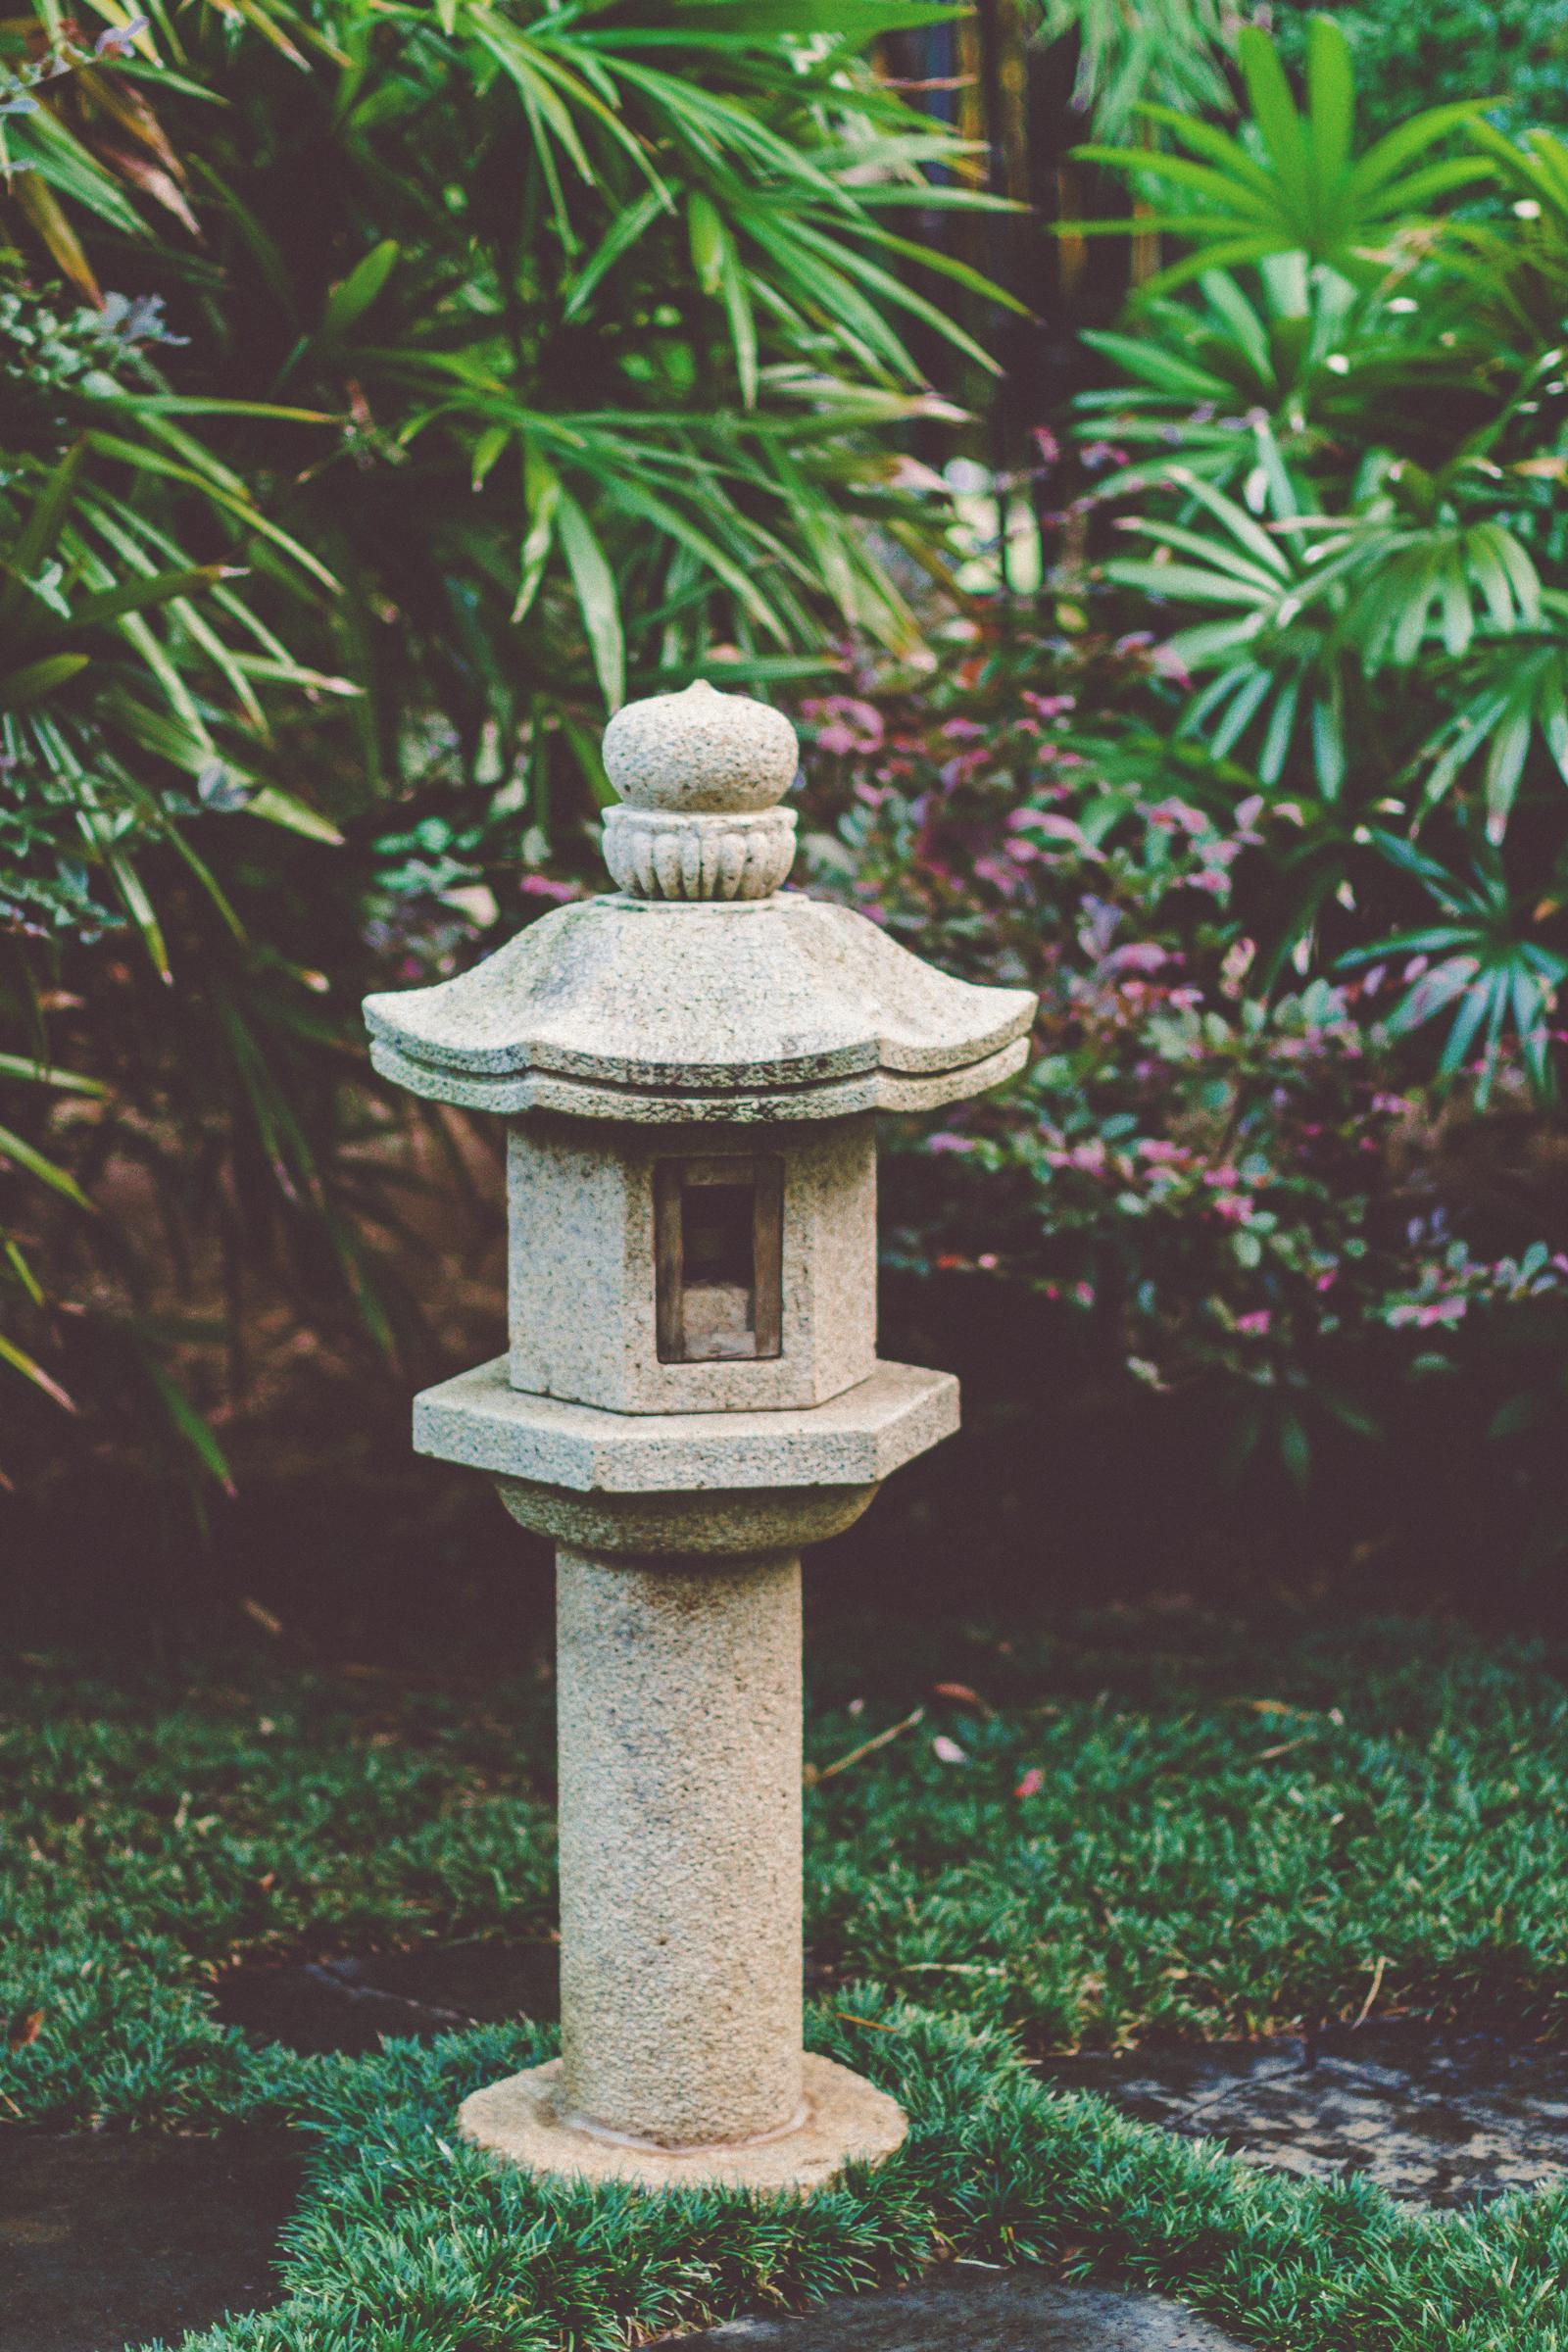 IMG_0300--KAUAI-HAWAII-JENNIFER-PICARD-PHOTOGRAPHY.jpg